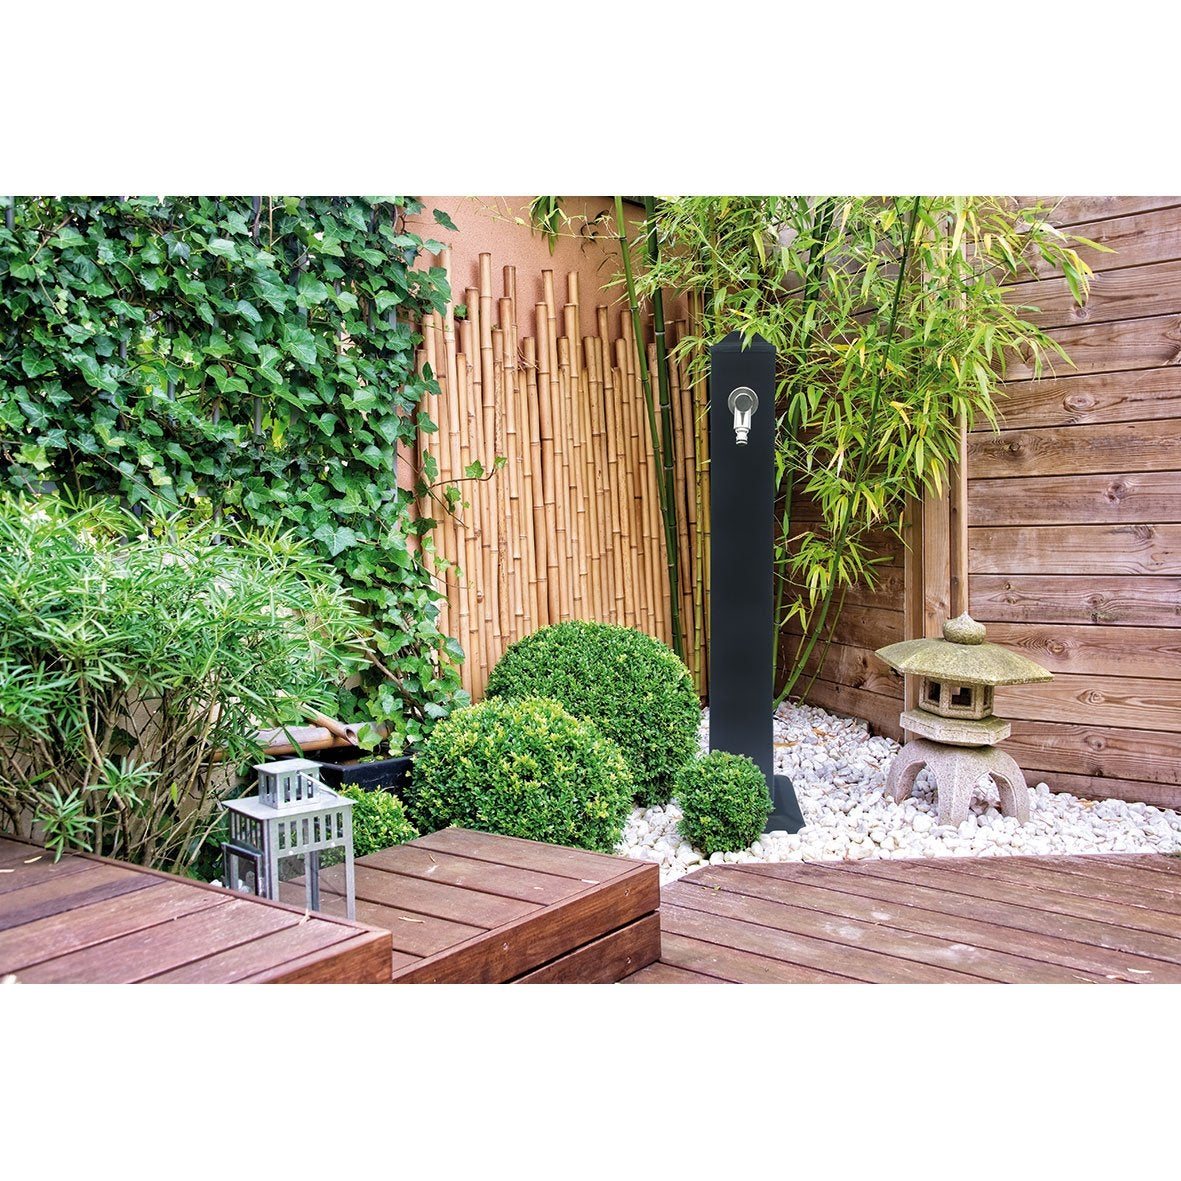 fontaine robinet en zinc anthracite vahanga leroy merlin. Black Bedroom Furniture Sets. Home Design Ideas